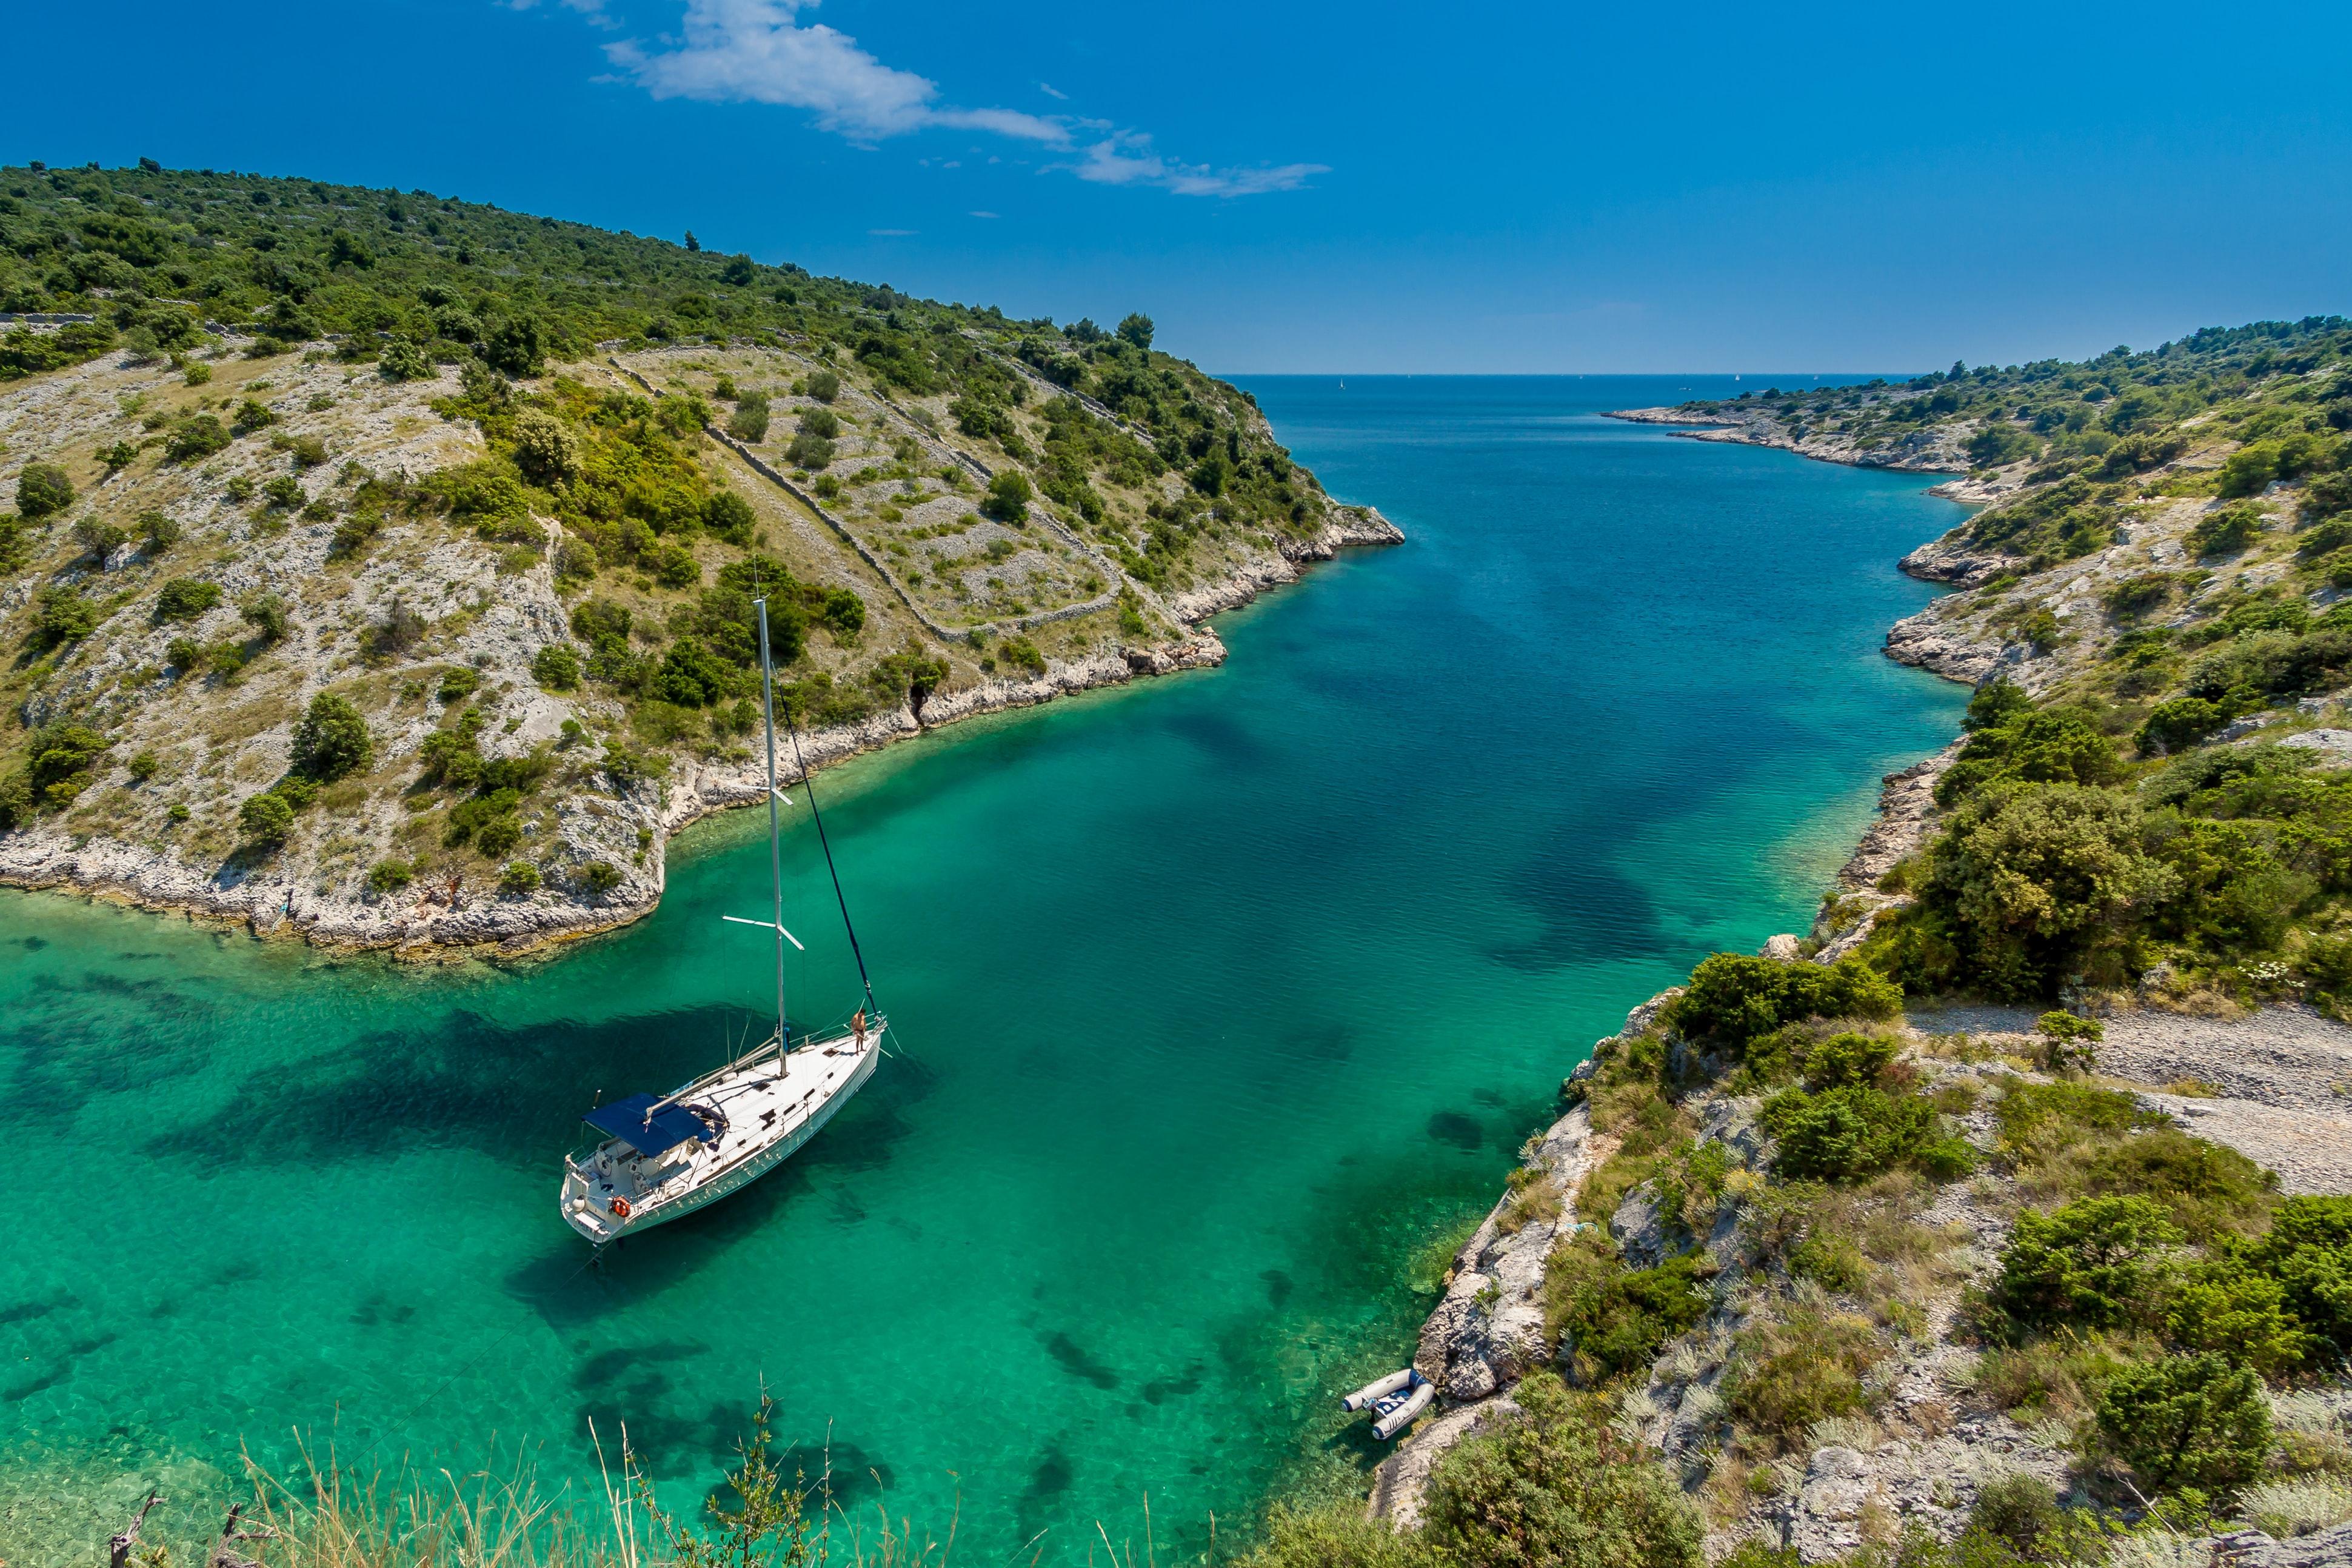 Travel by boat in Trogir, Croatia